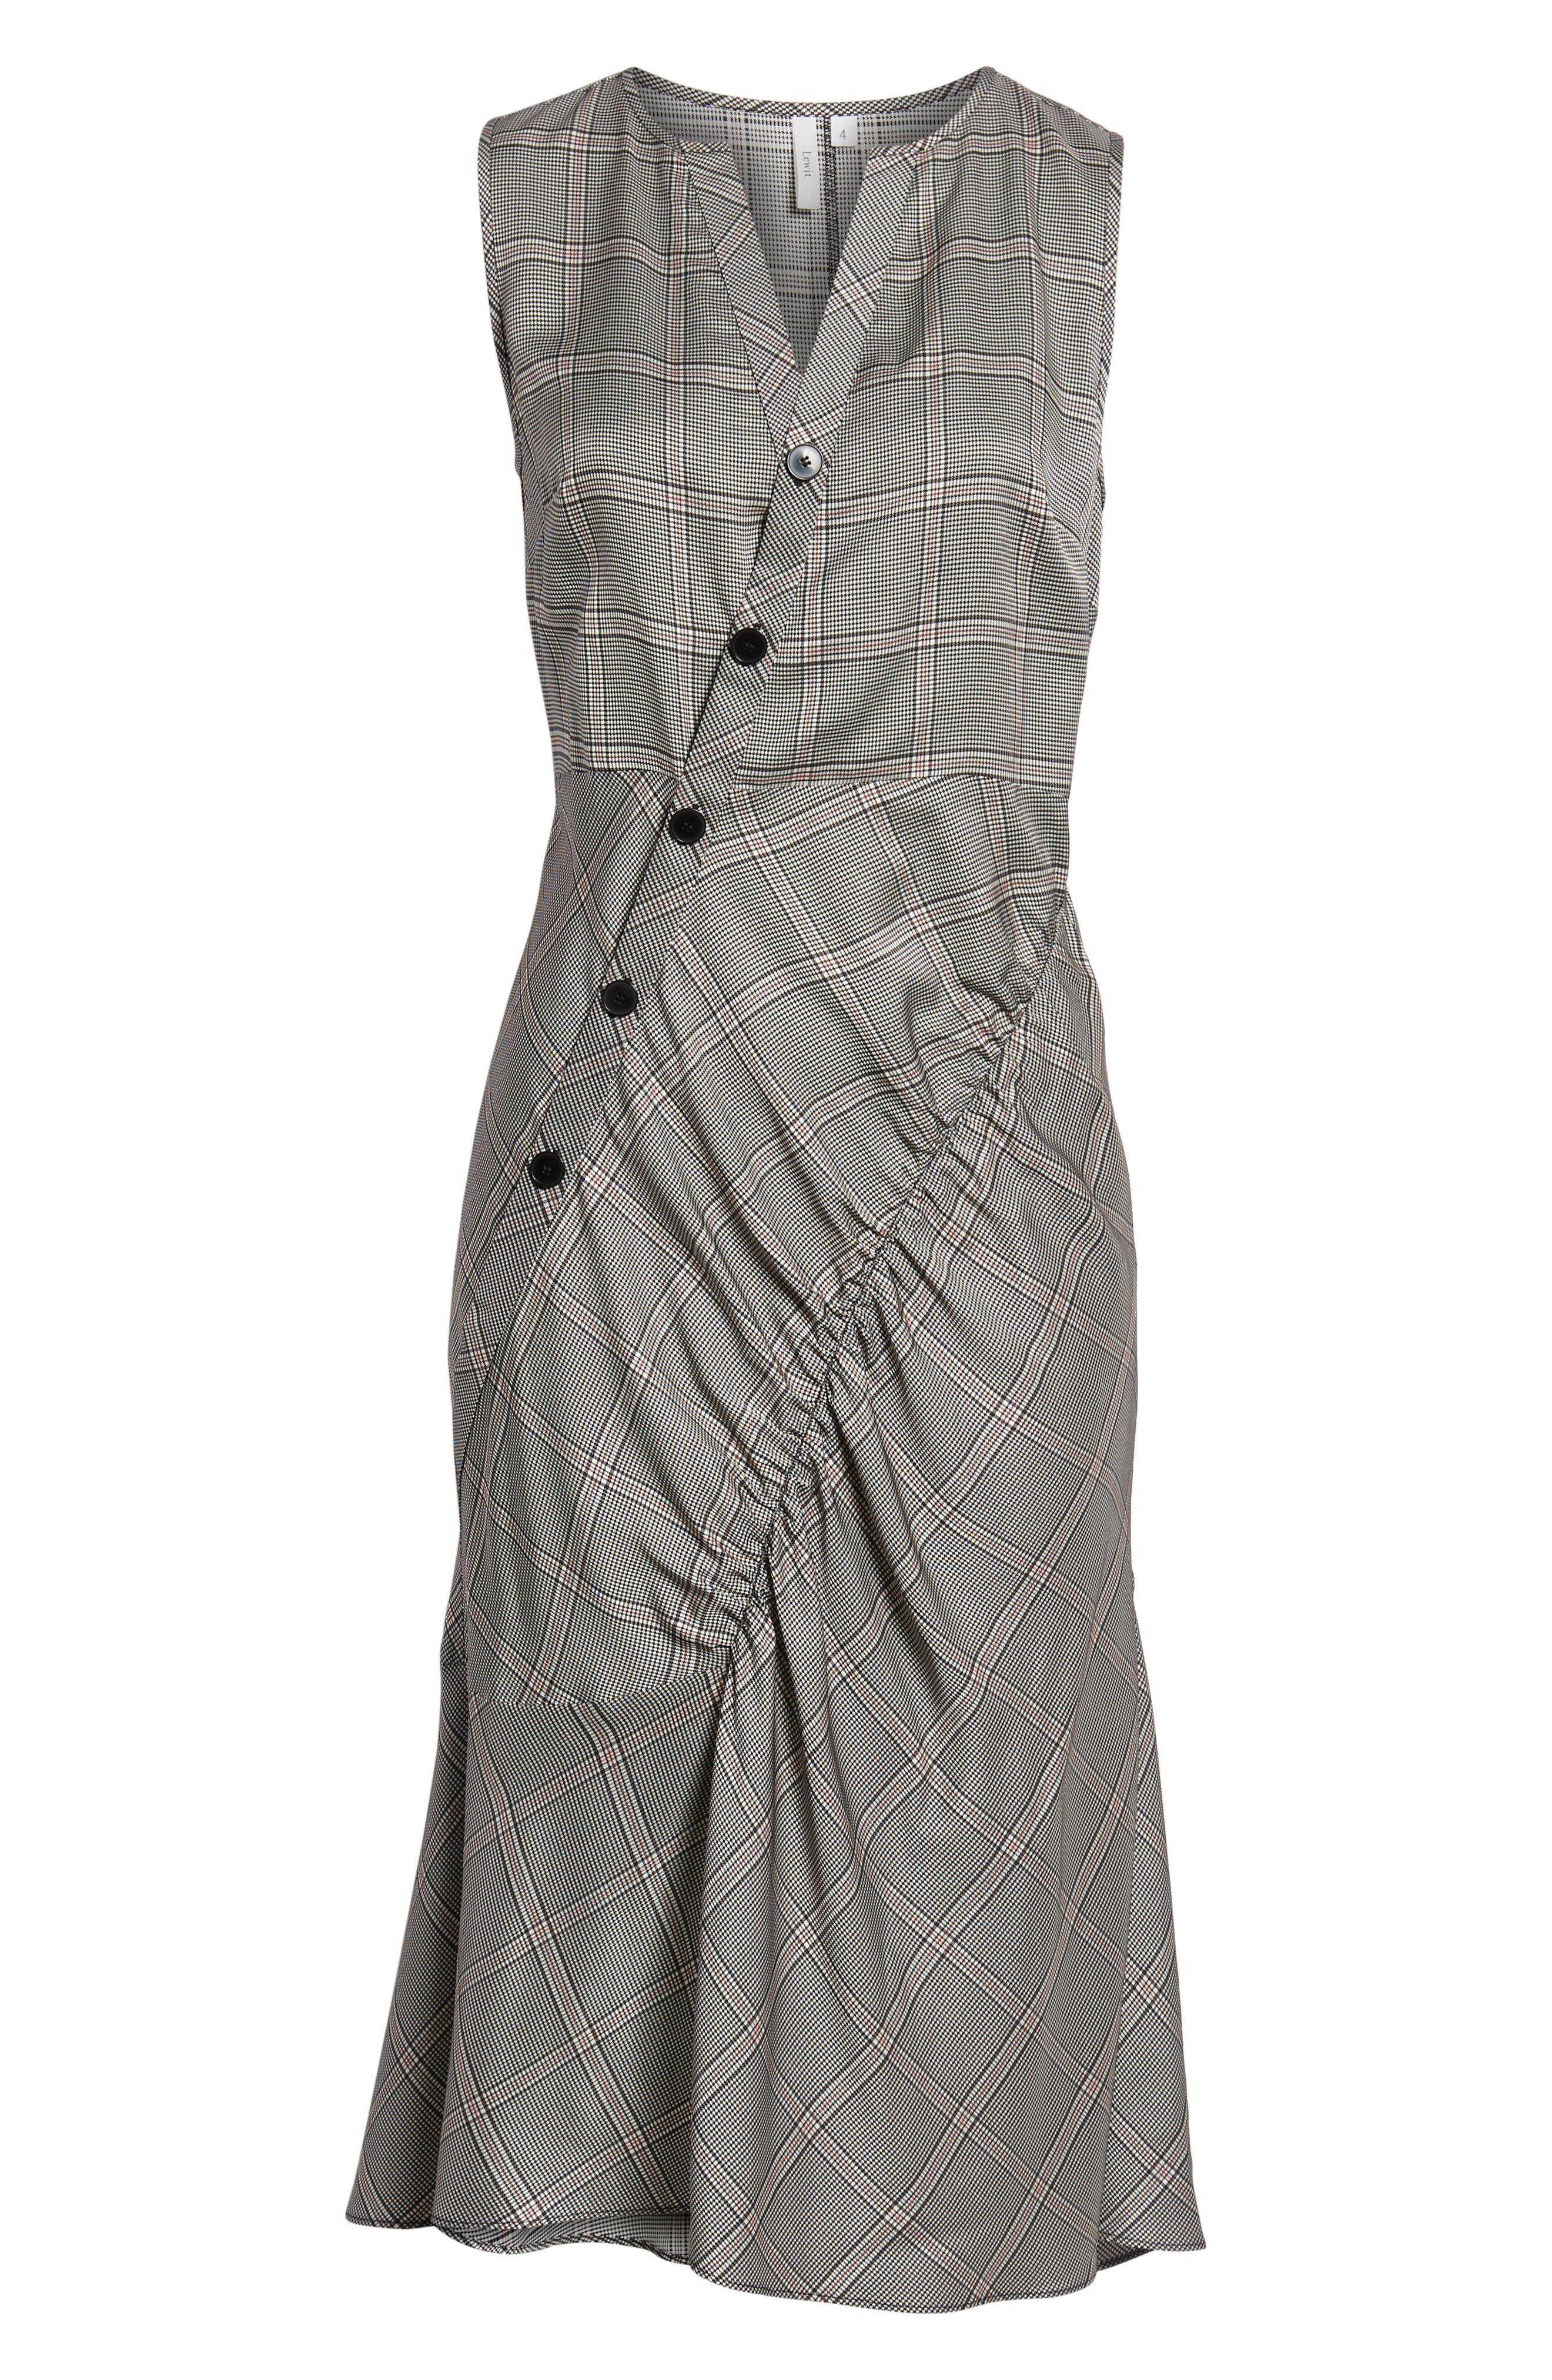 Seam Detail Sleeveless Check Dress,                             Alternate thumbnail 6, color,                             Black York Check